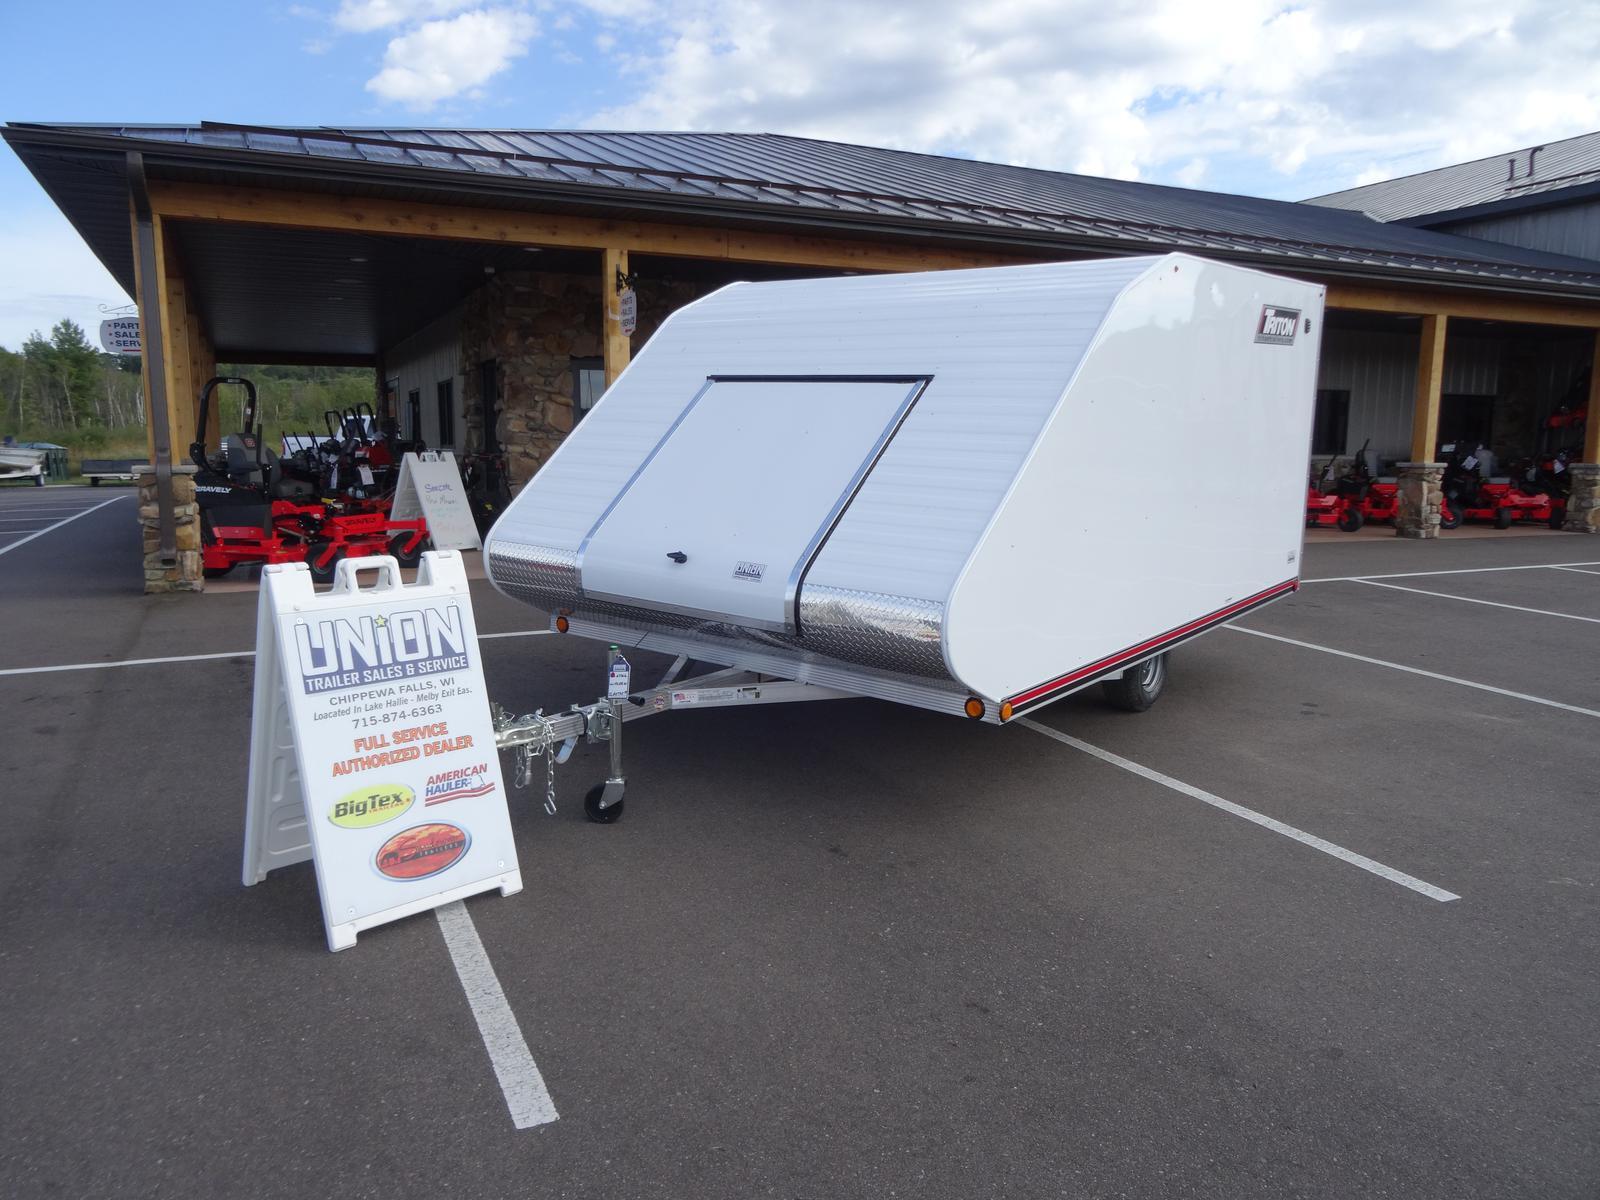 2019 Triton Tc128 2 Place Hybrid Snowmobile Trailer For Sale In Wiring Harness Dsc01924